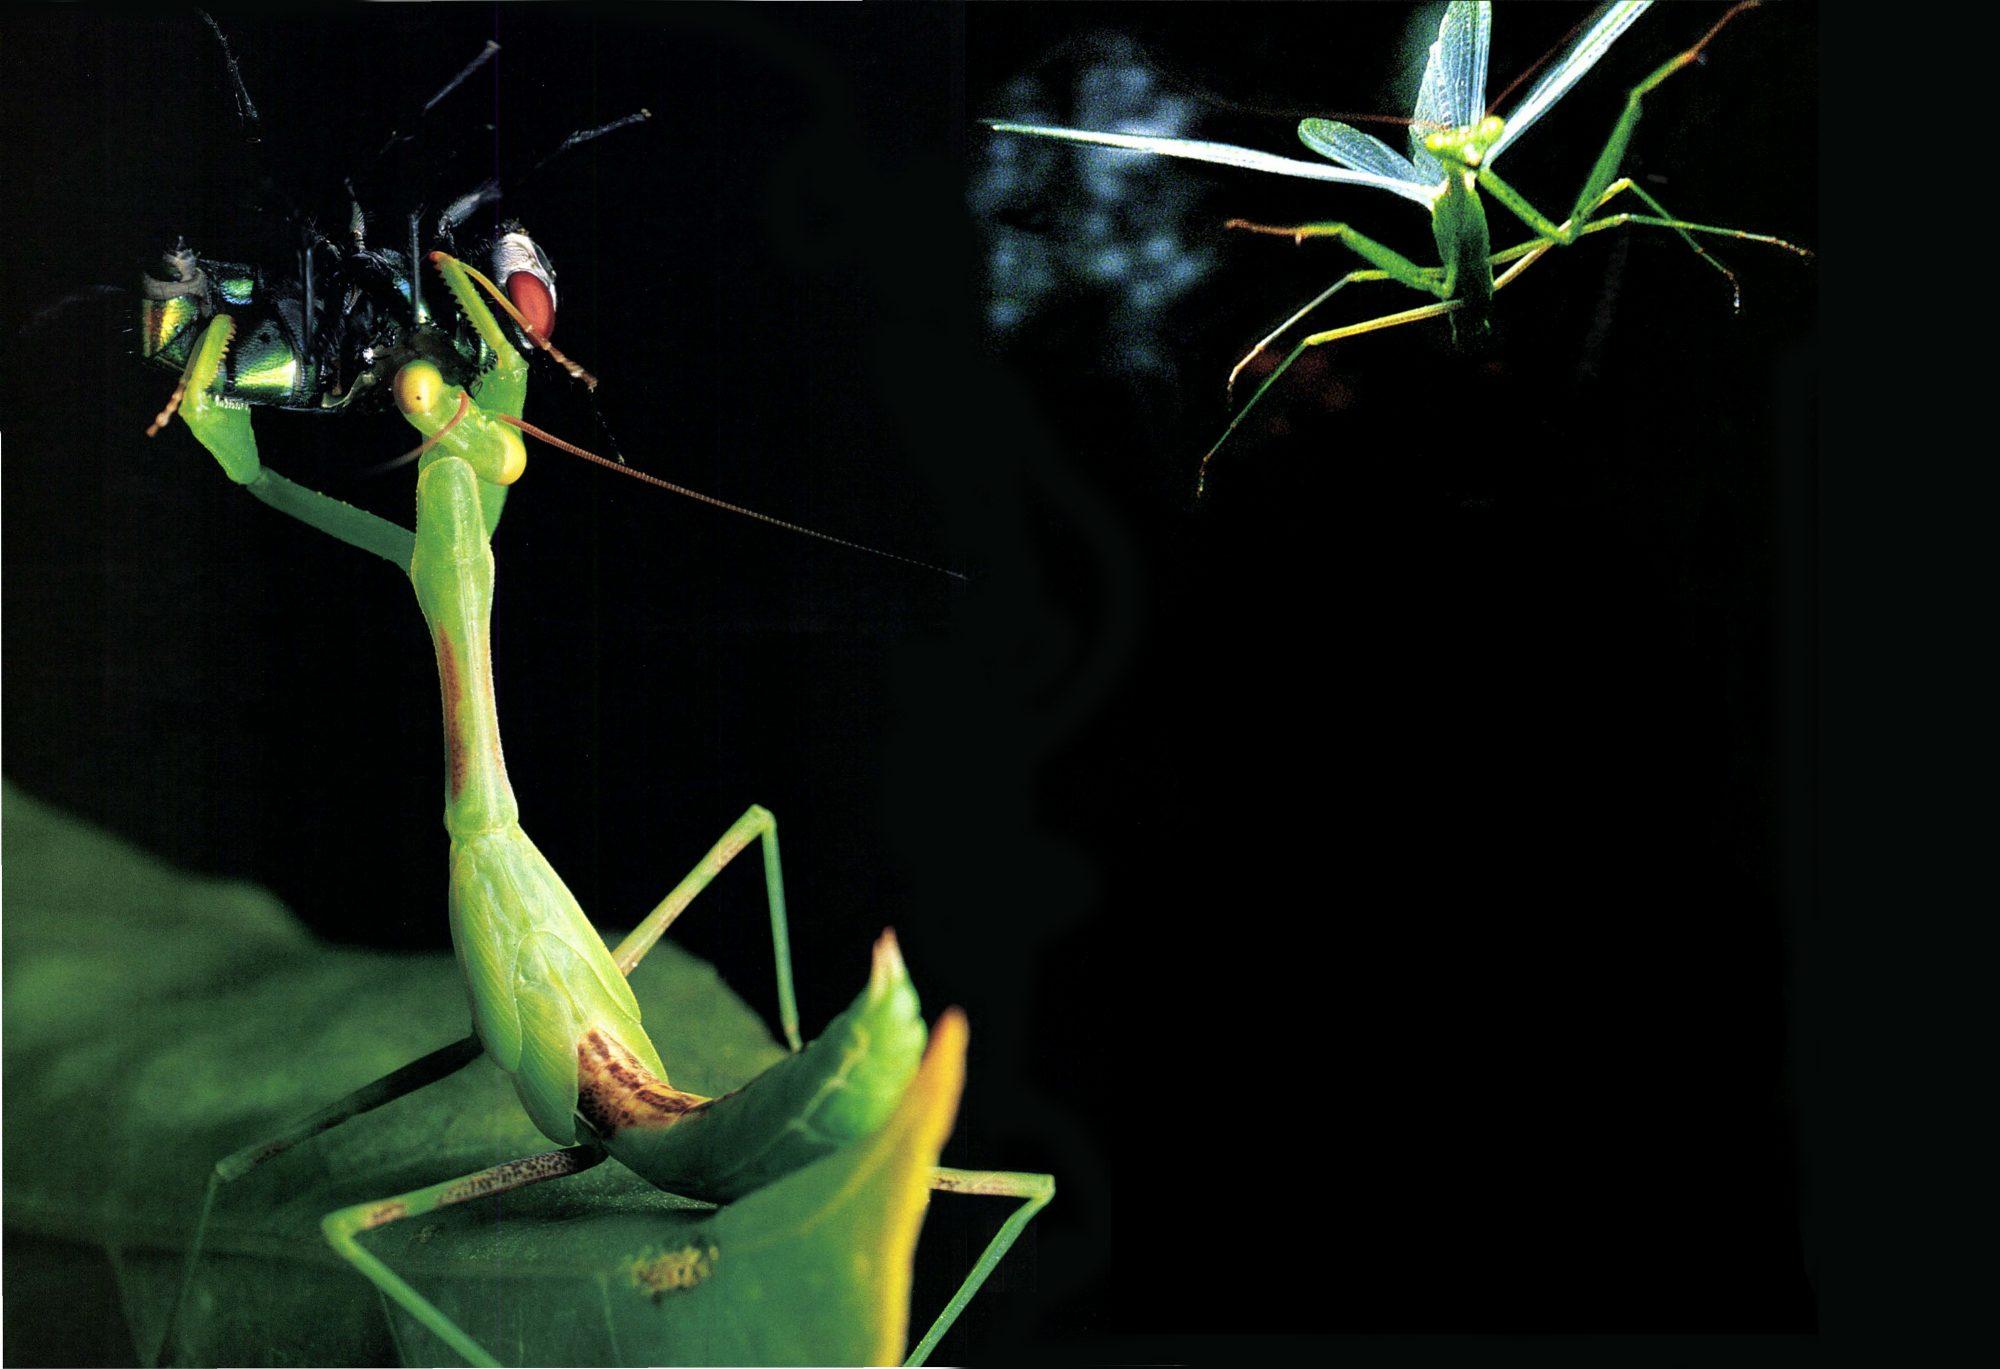 praying mantis eggs for sale australia